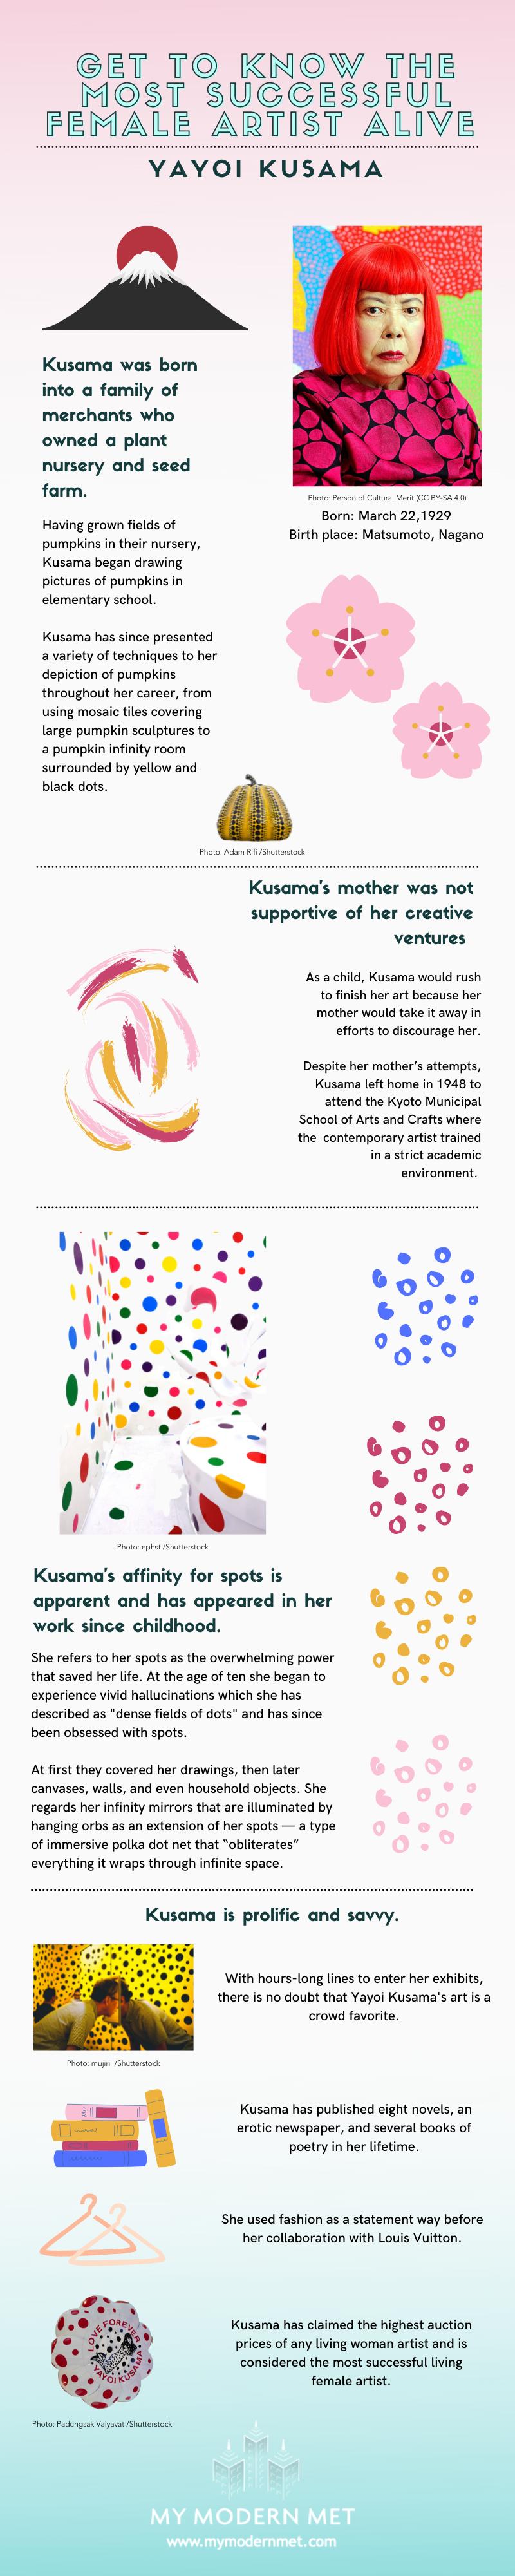 Yayoi Kusama Infographic